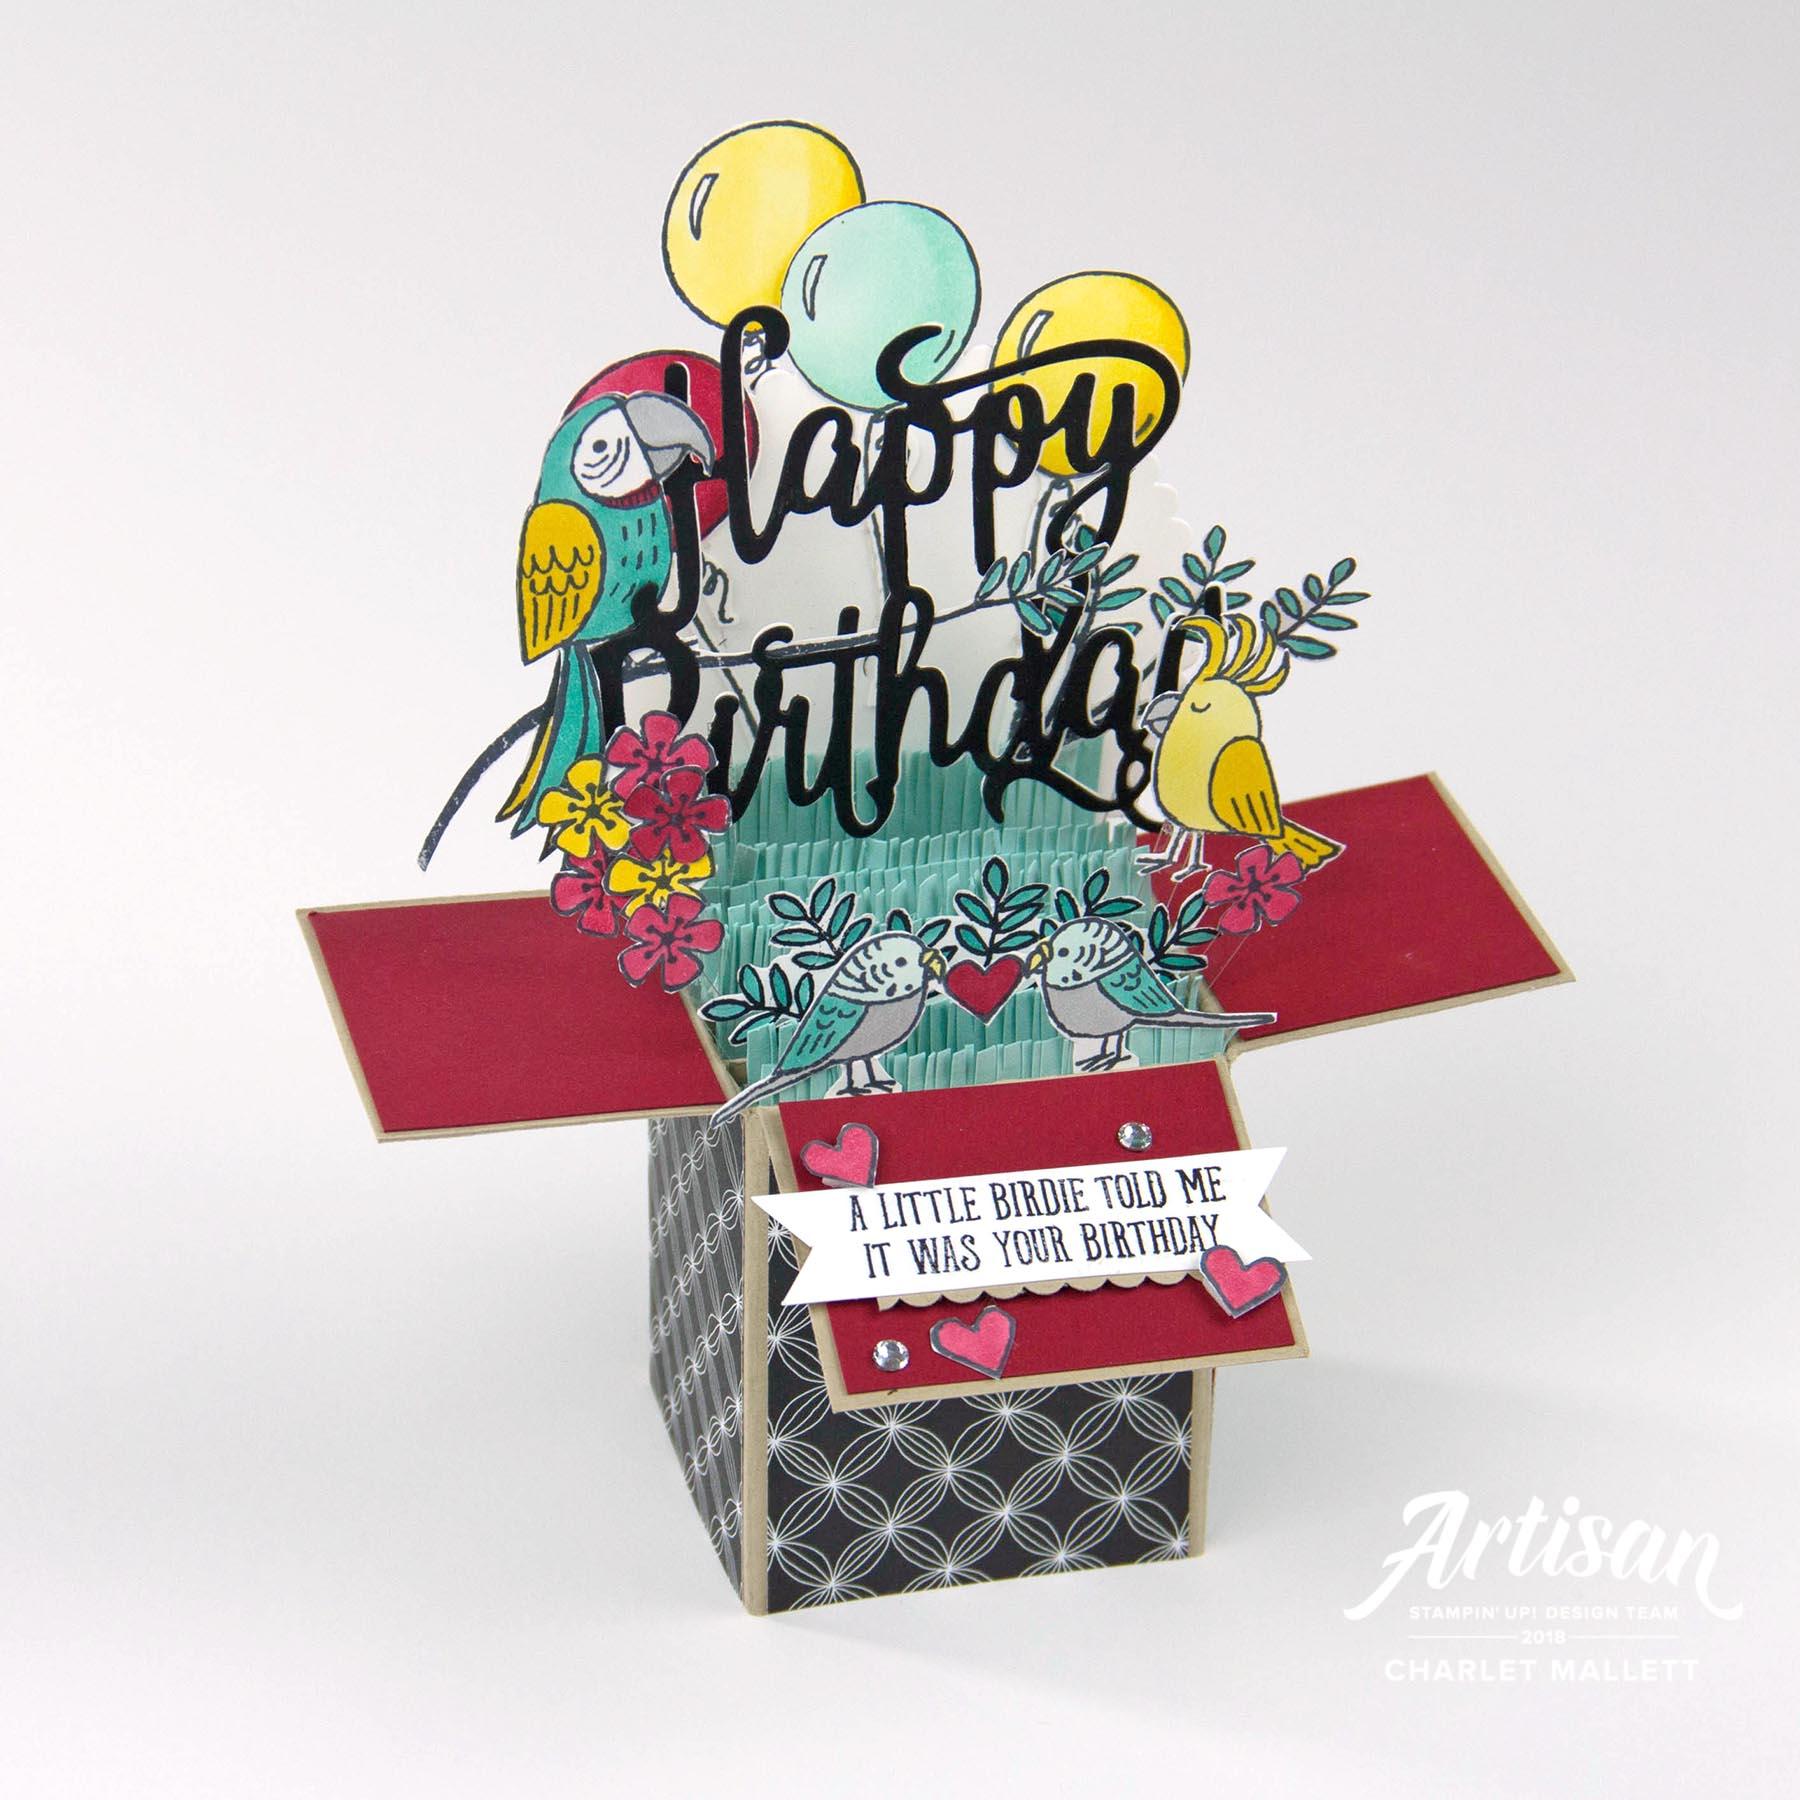 Bird Banter Card in a Box - Charlet Mallett, Stampin' Up!